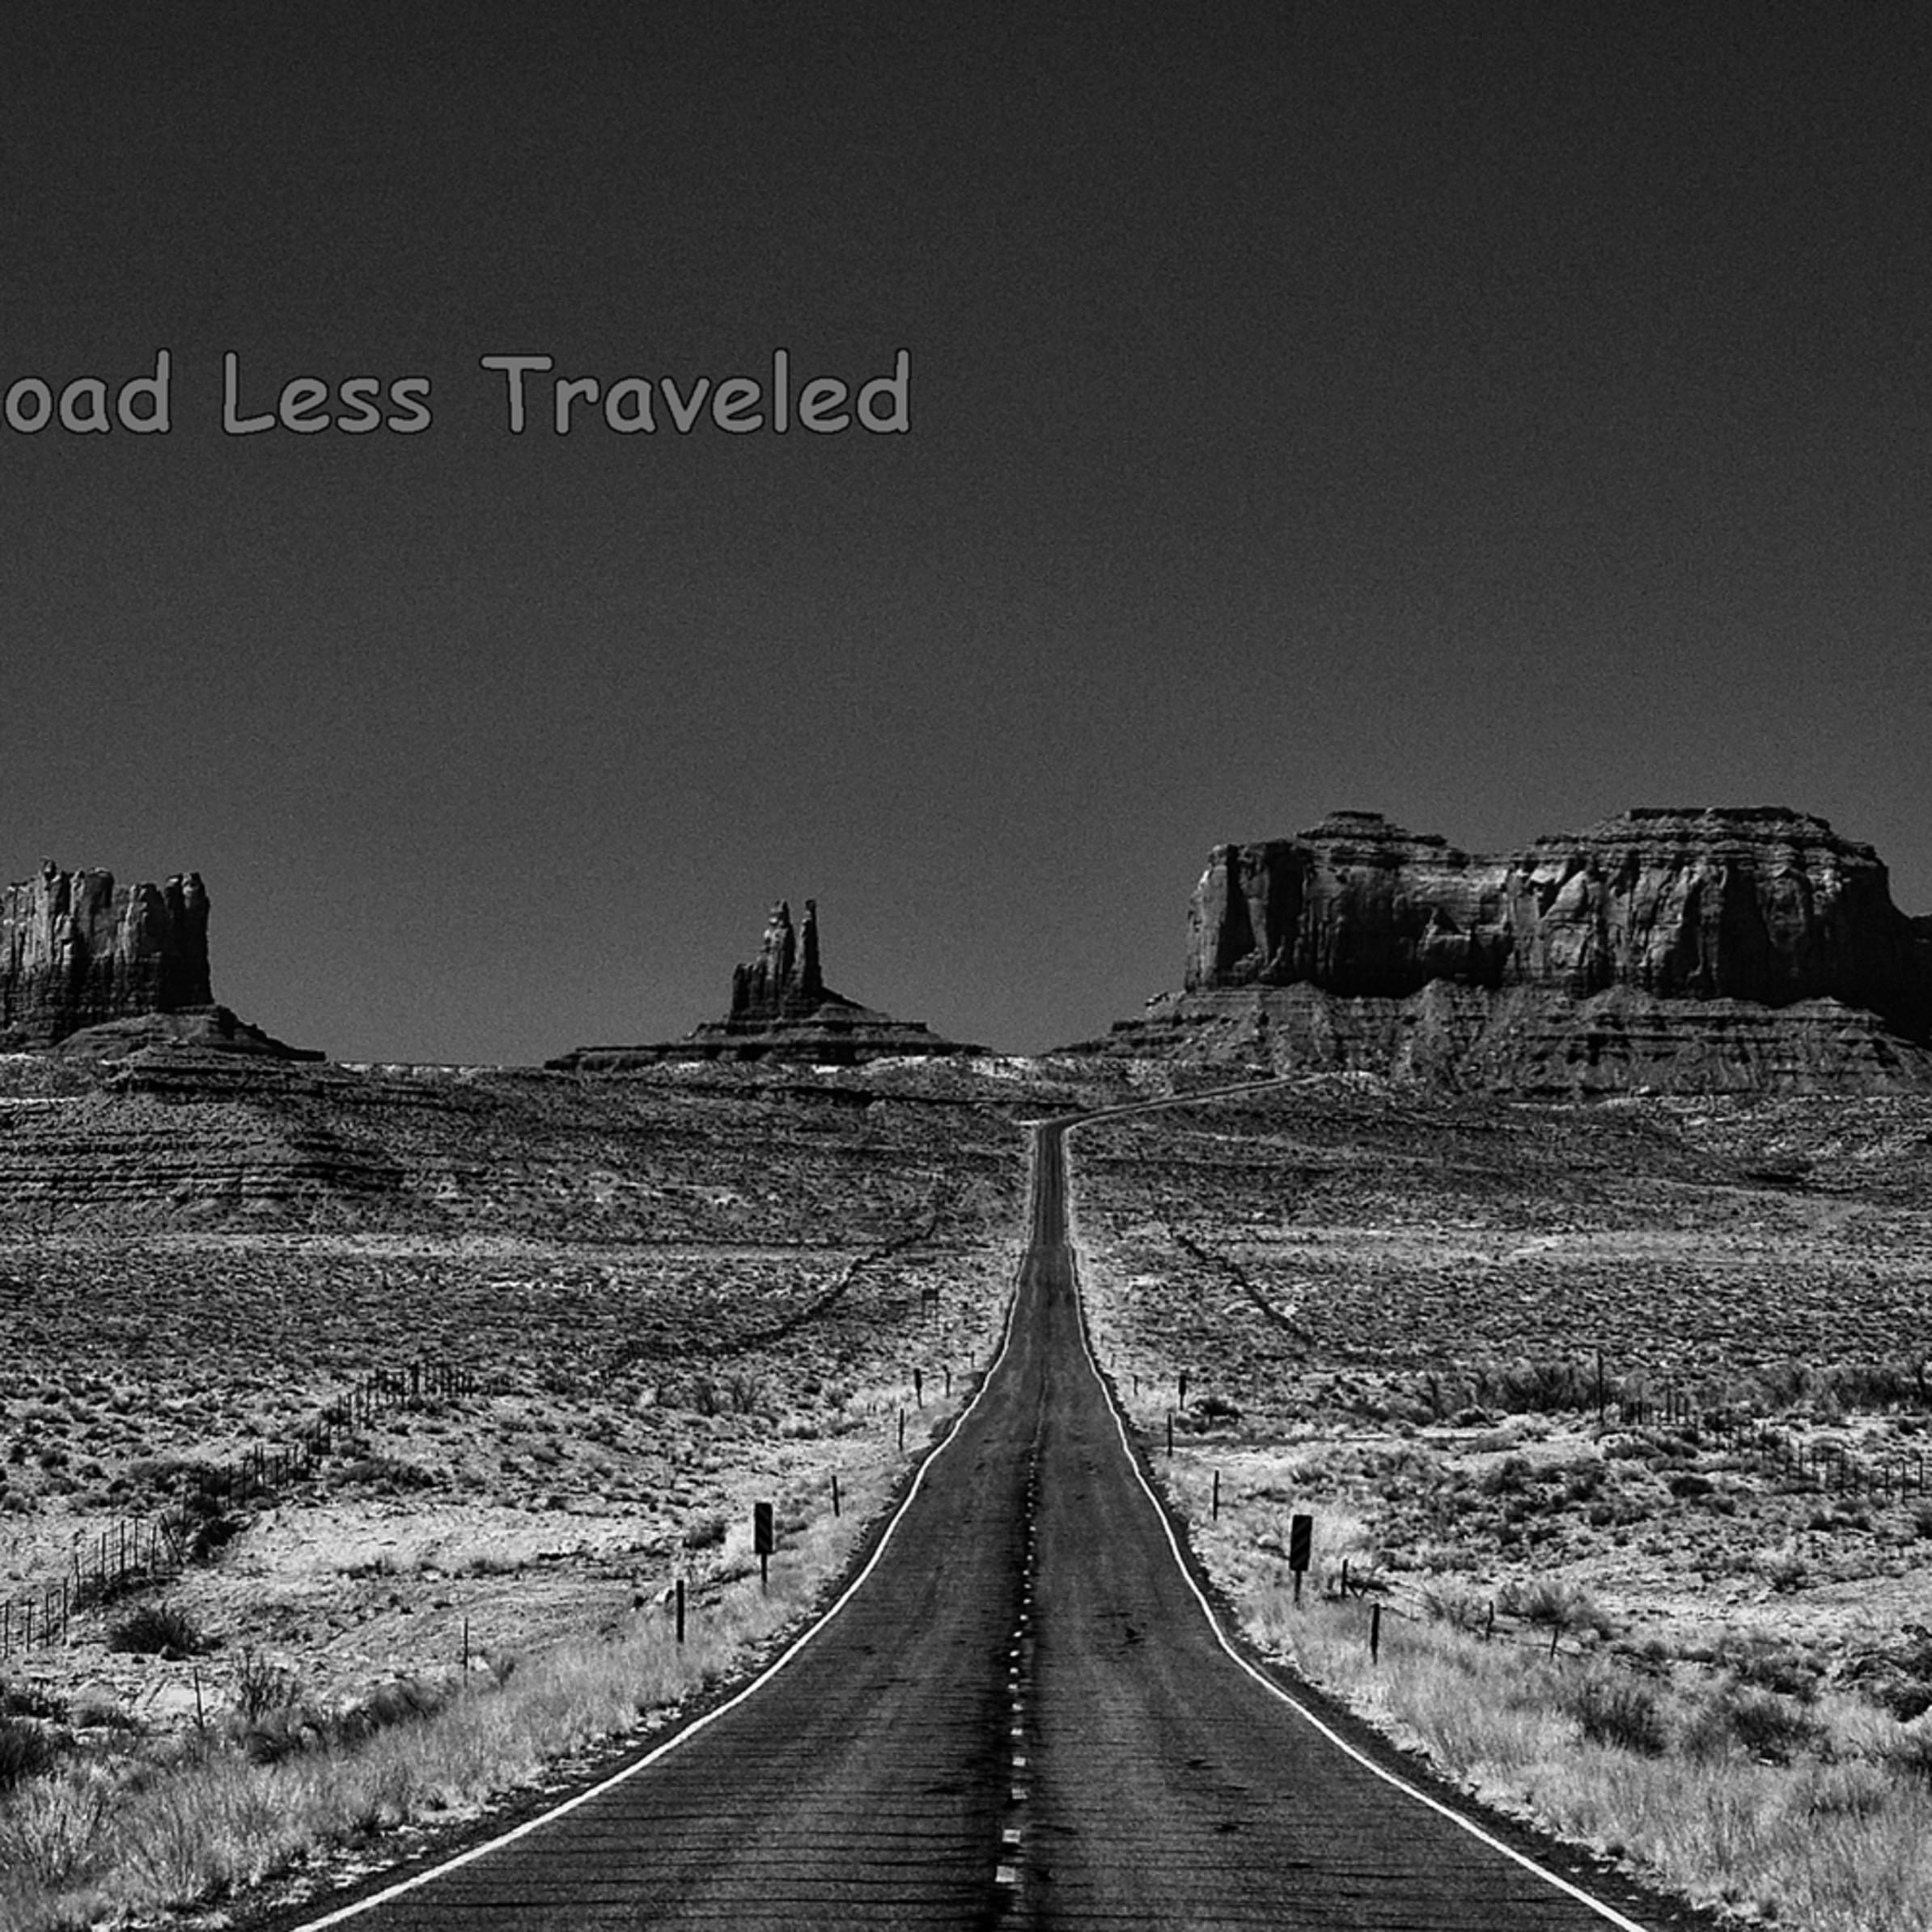 Take the road less traveled kljha8